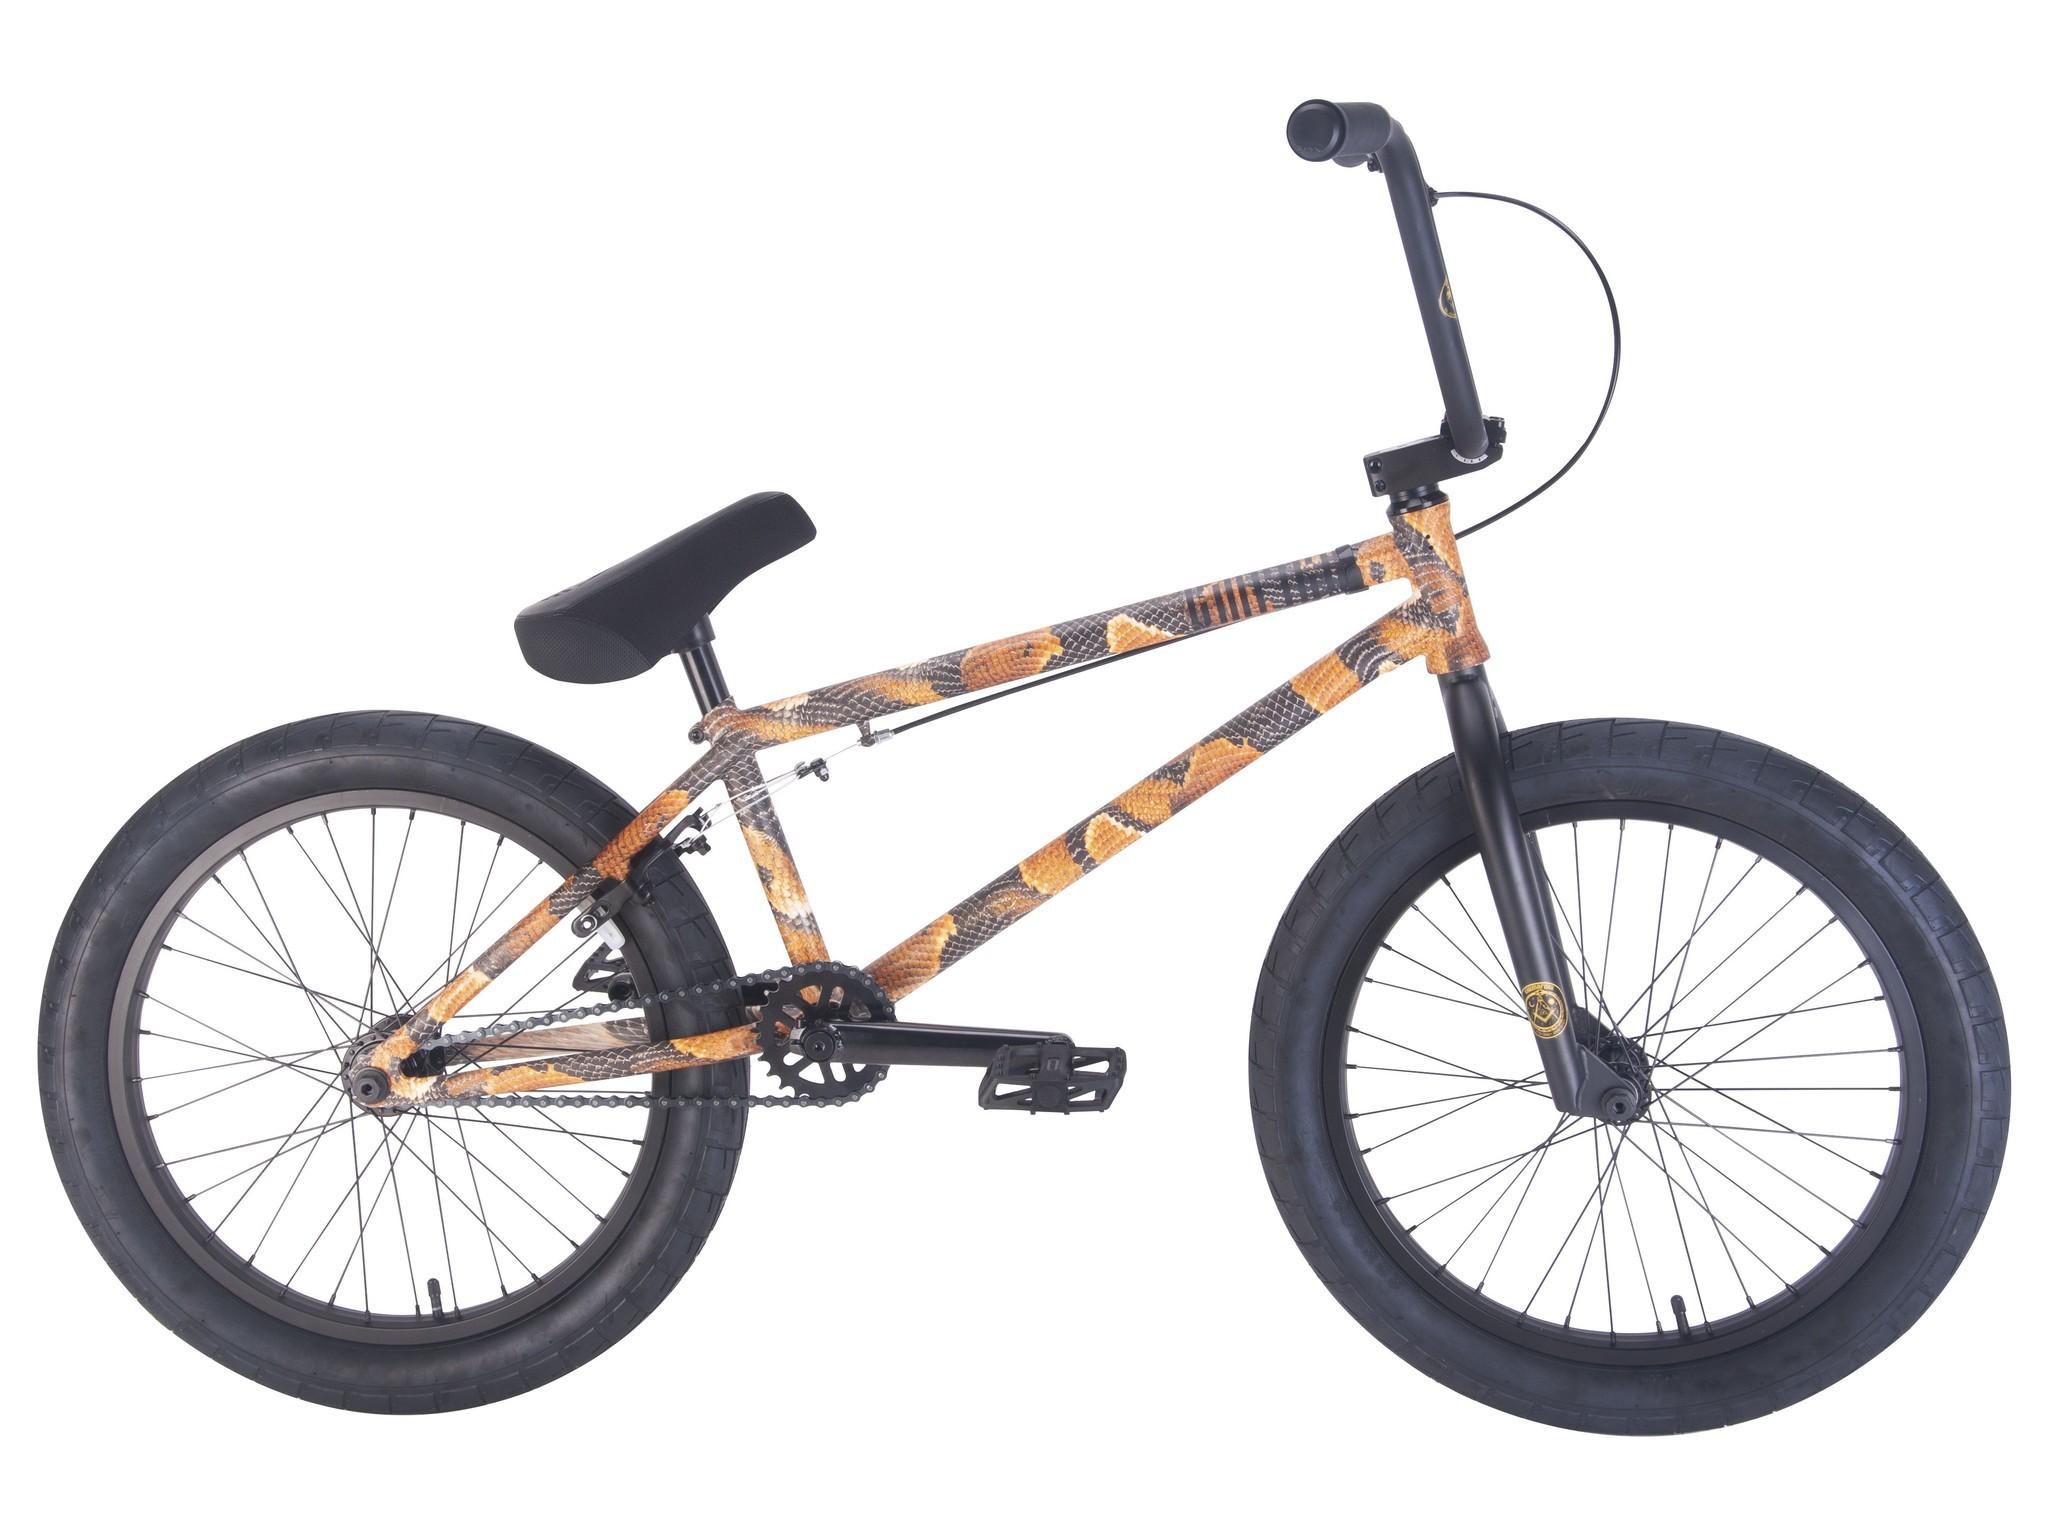 BMX Велосипед Karma Empire LT 2020 (змеиная кожа)